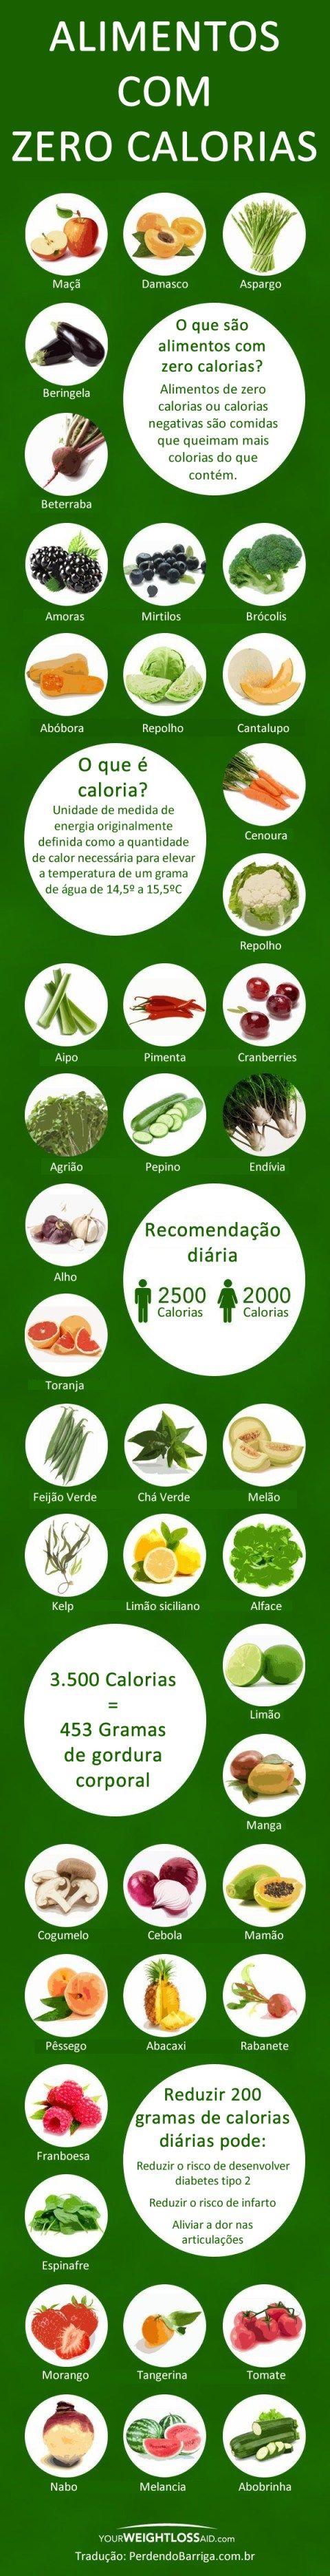 Alimentos zero calorias: